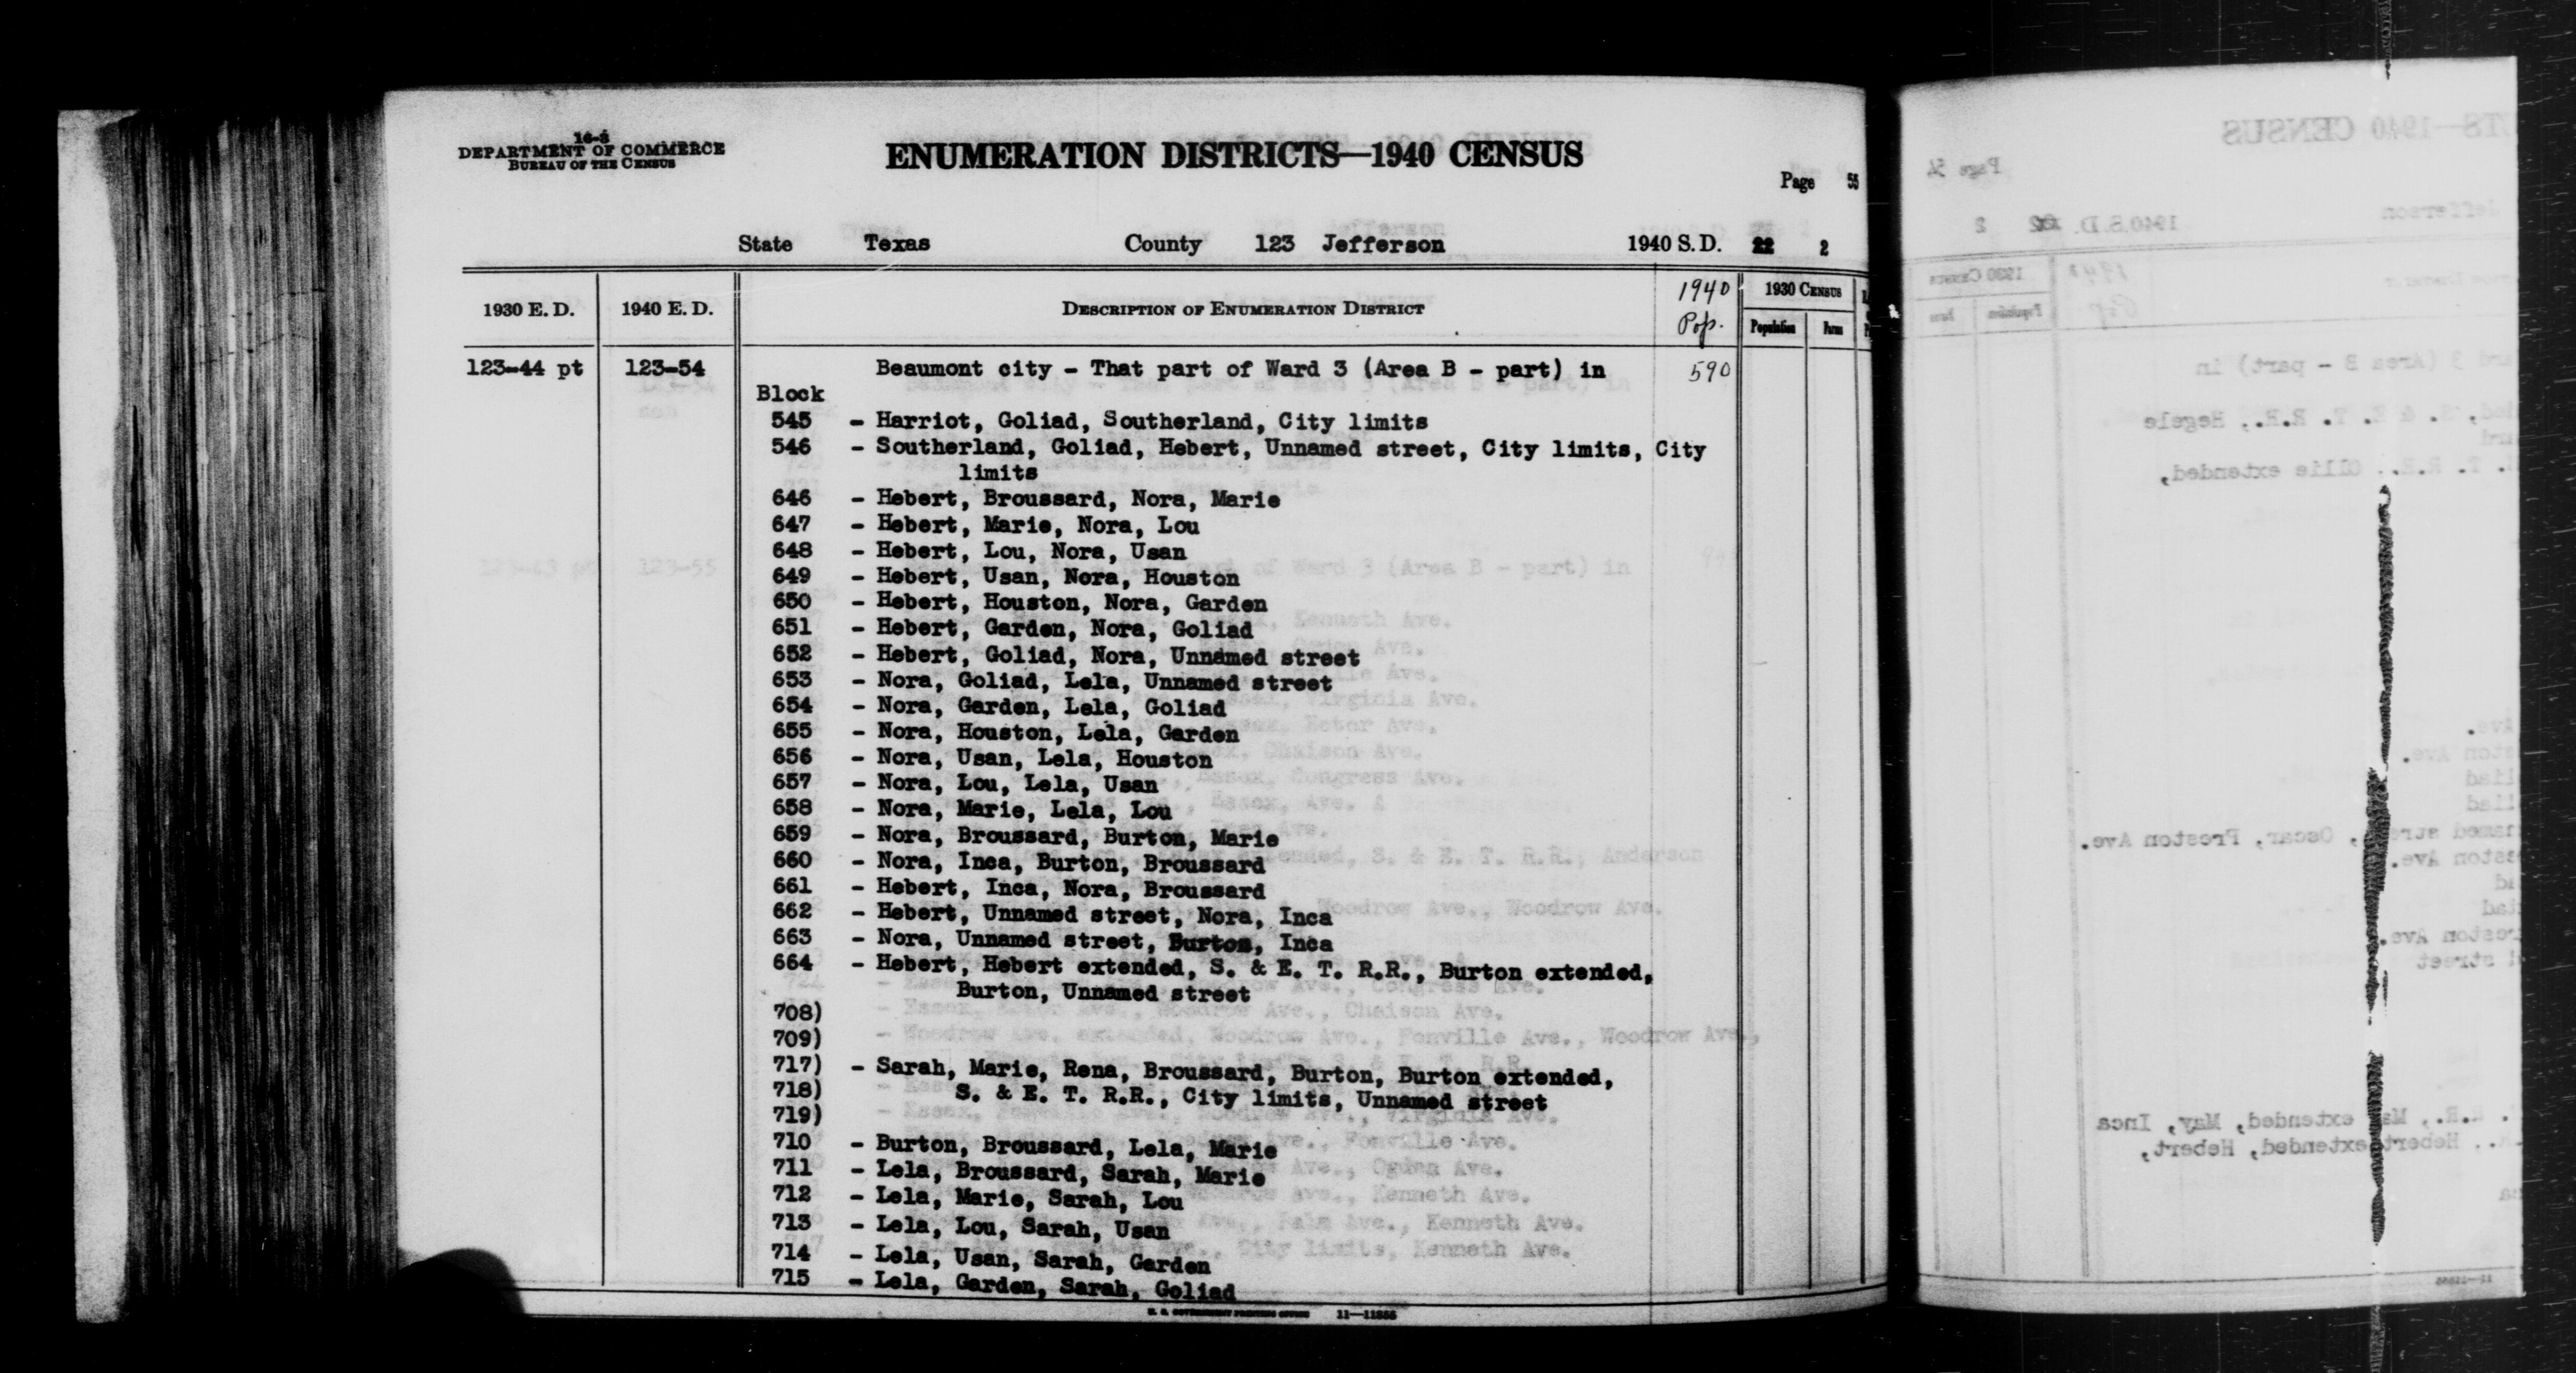 1940 Census Enumeration District Descriptions - Texas - Jefferson County - ED 123-54